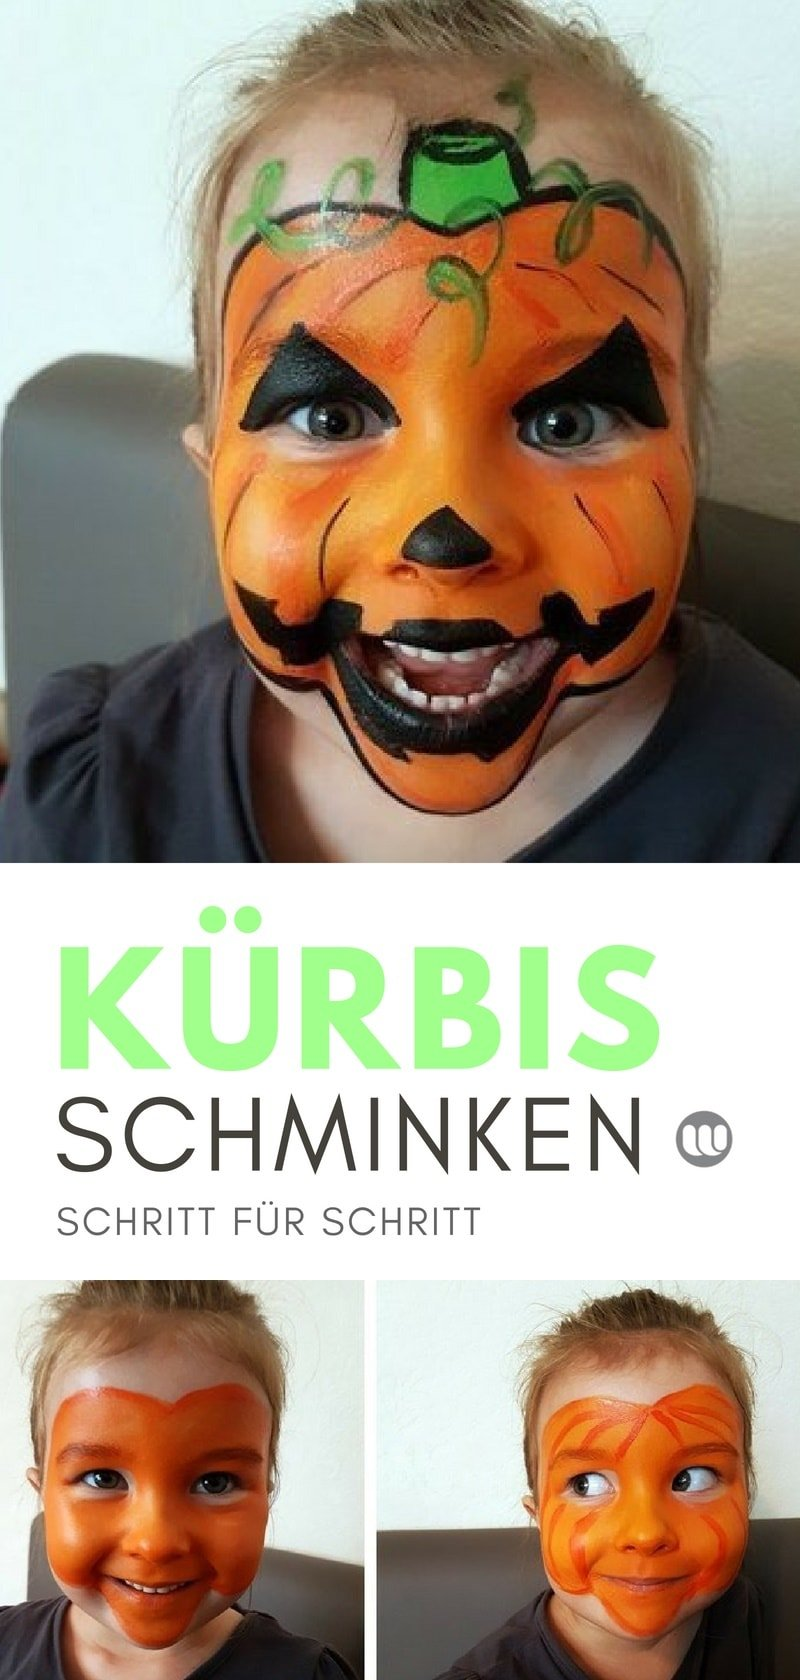 Schminkkanleitung zum Kürbis Schminken bei Kindern #Halloween #schminken #Kürbis